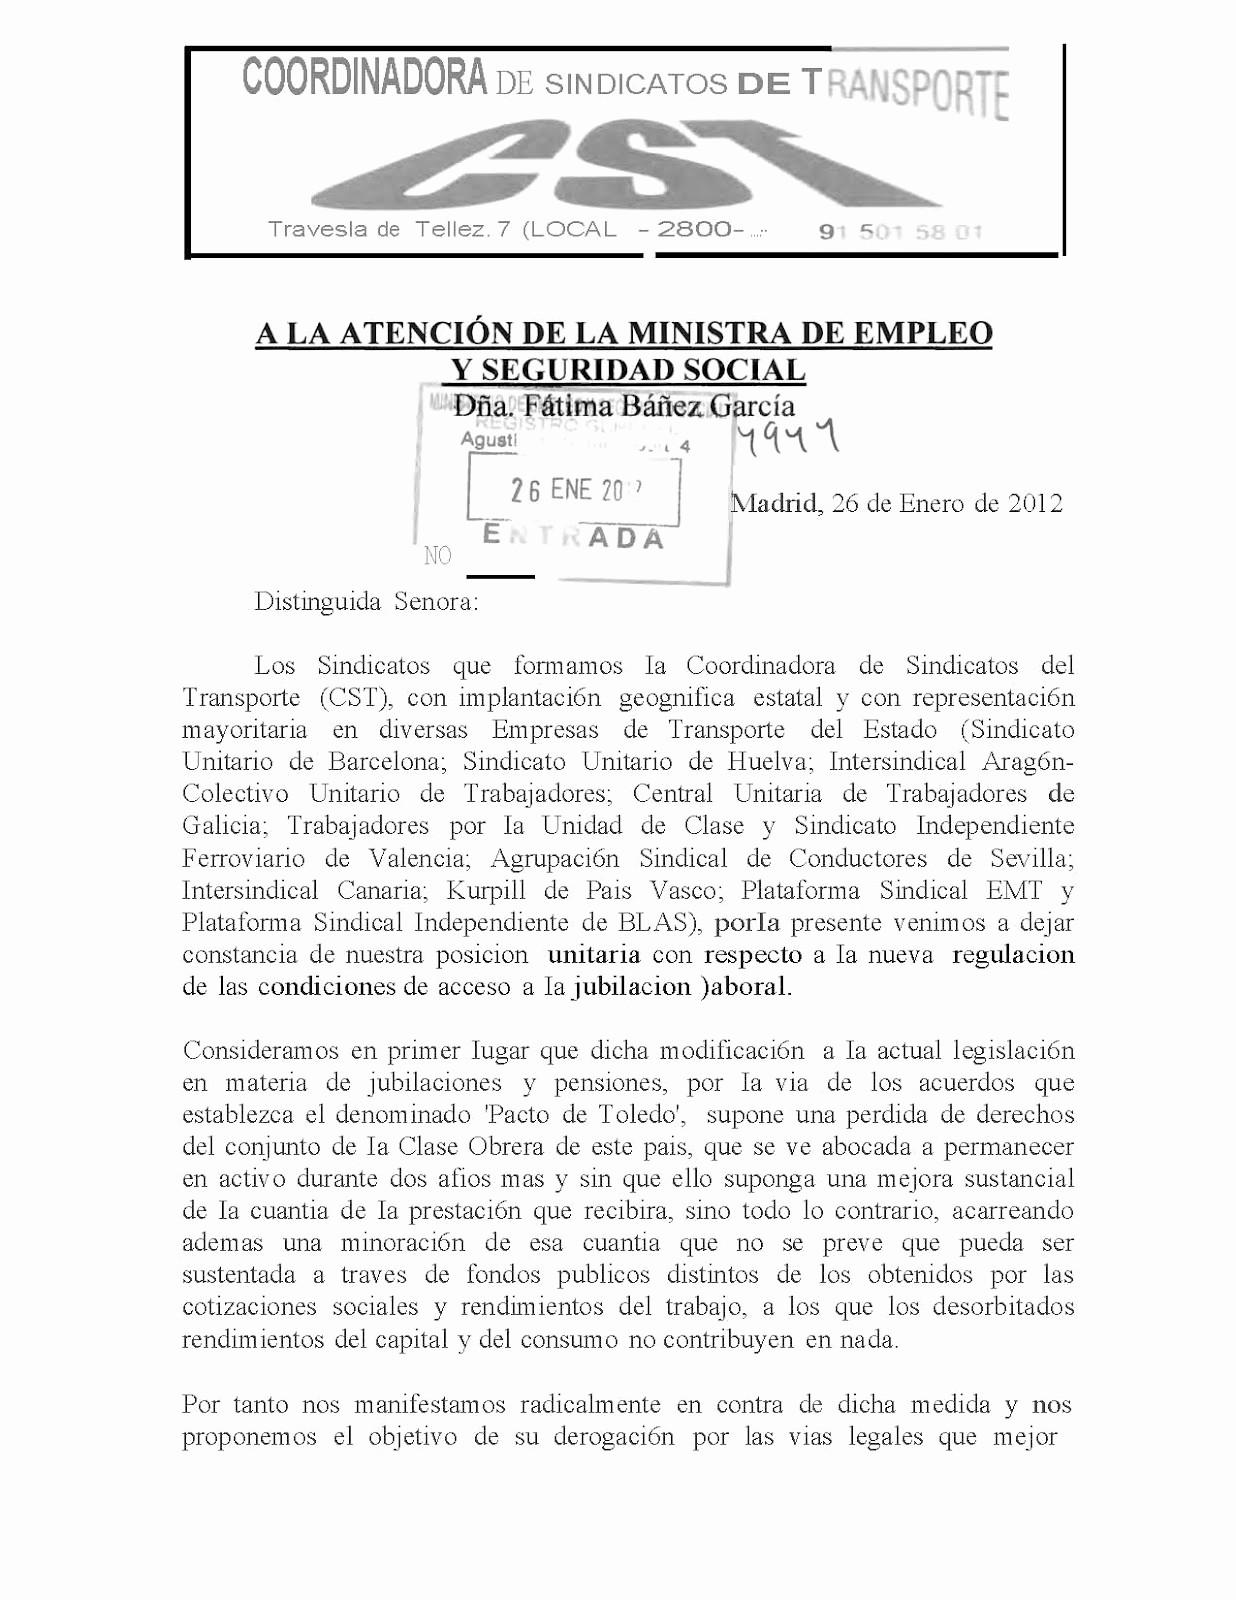 Formatos De Acuse De Recibo Elegant asc Sevilla Carta A La Ministra Acuse De Recibo